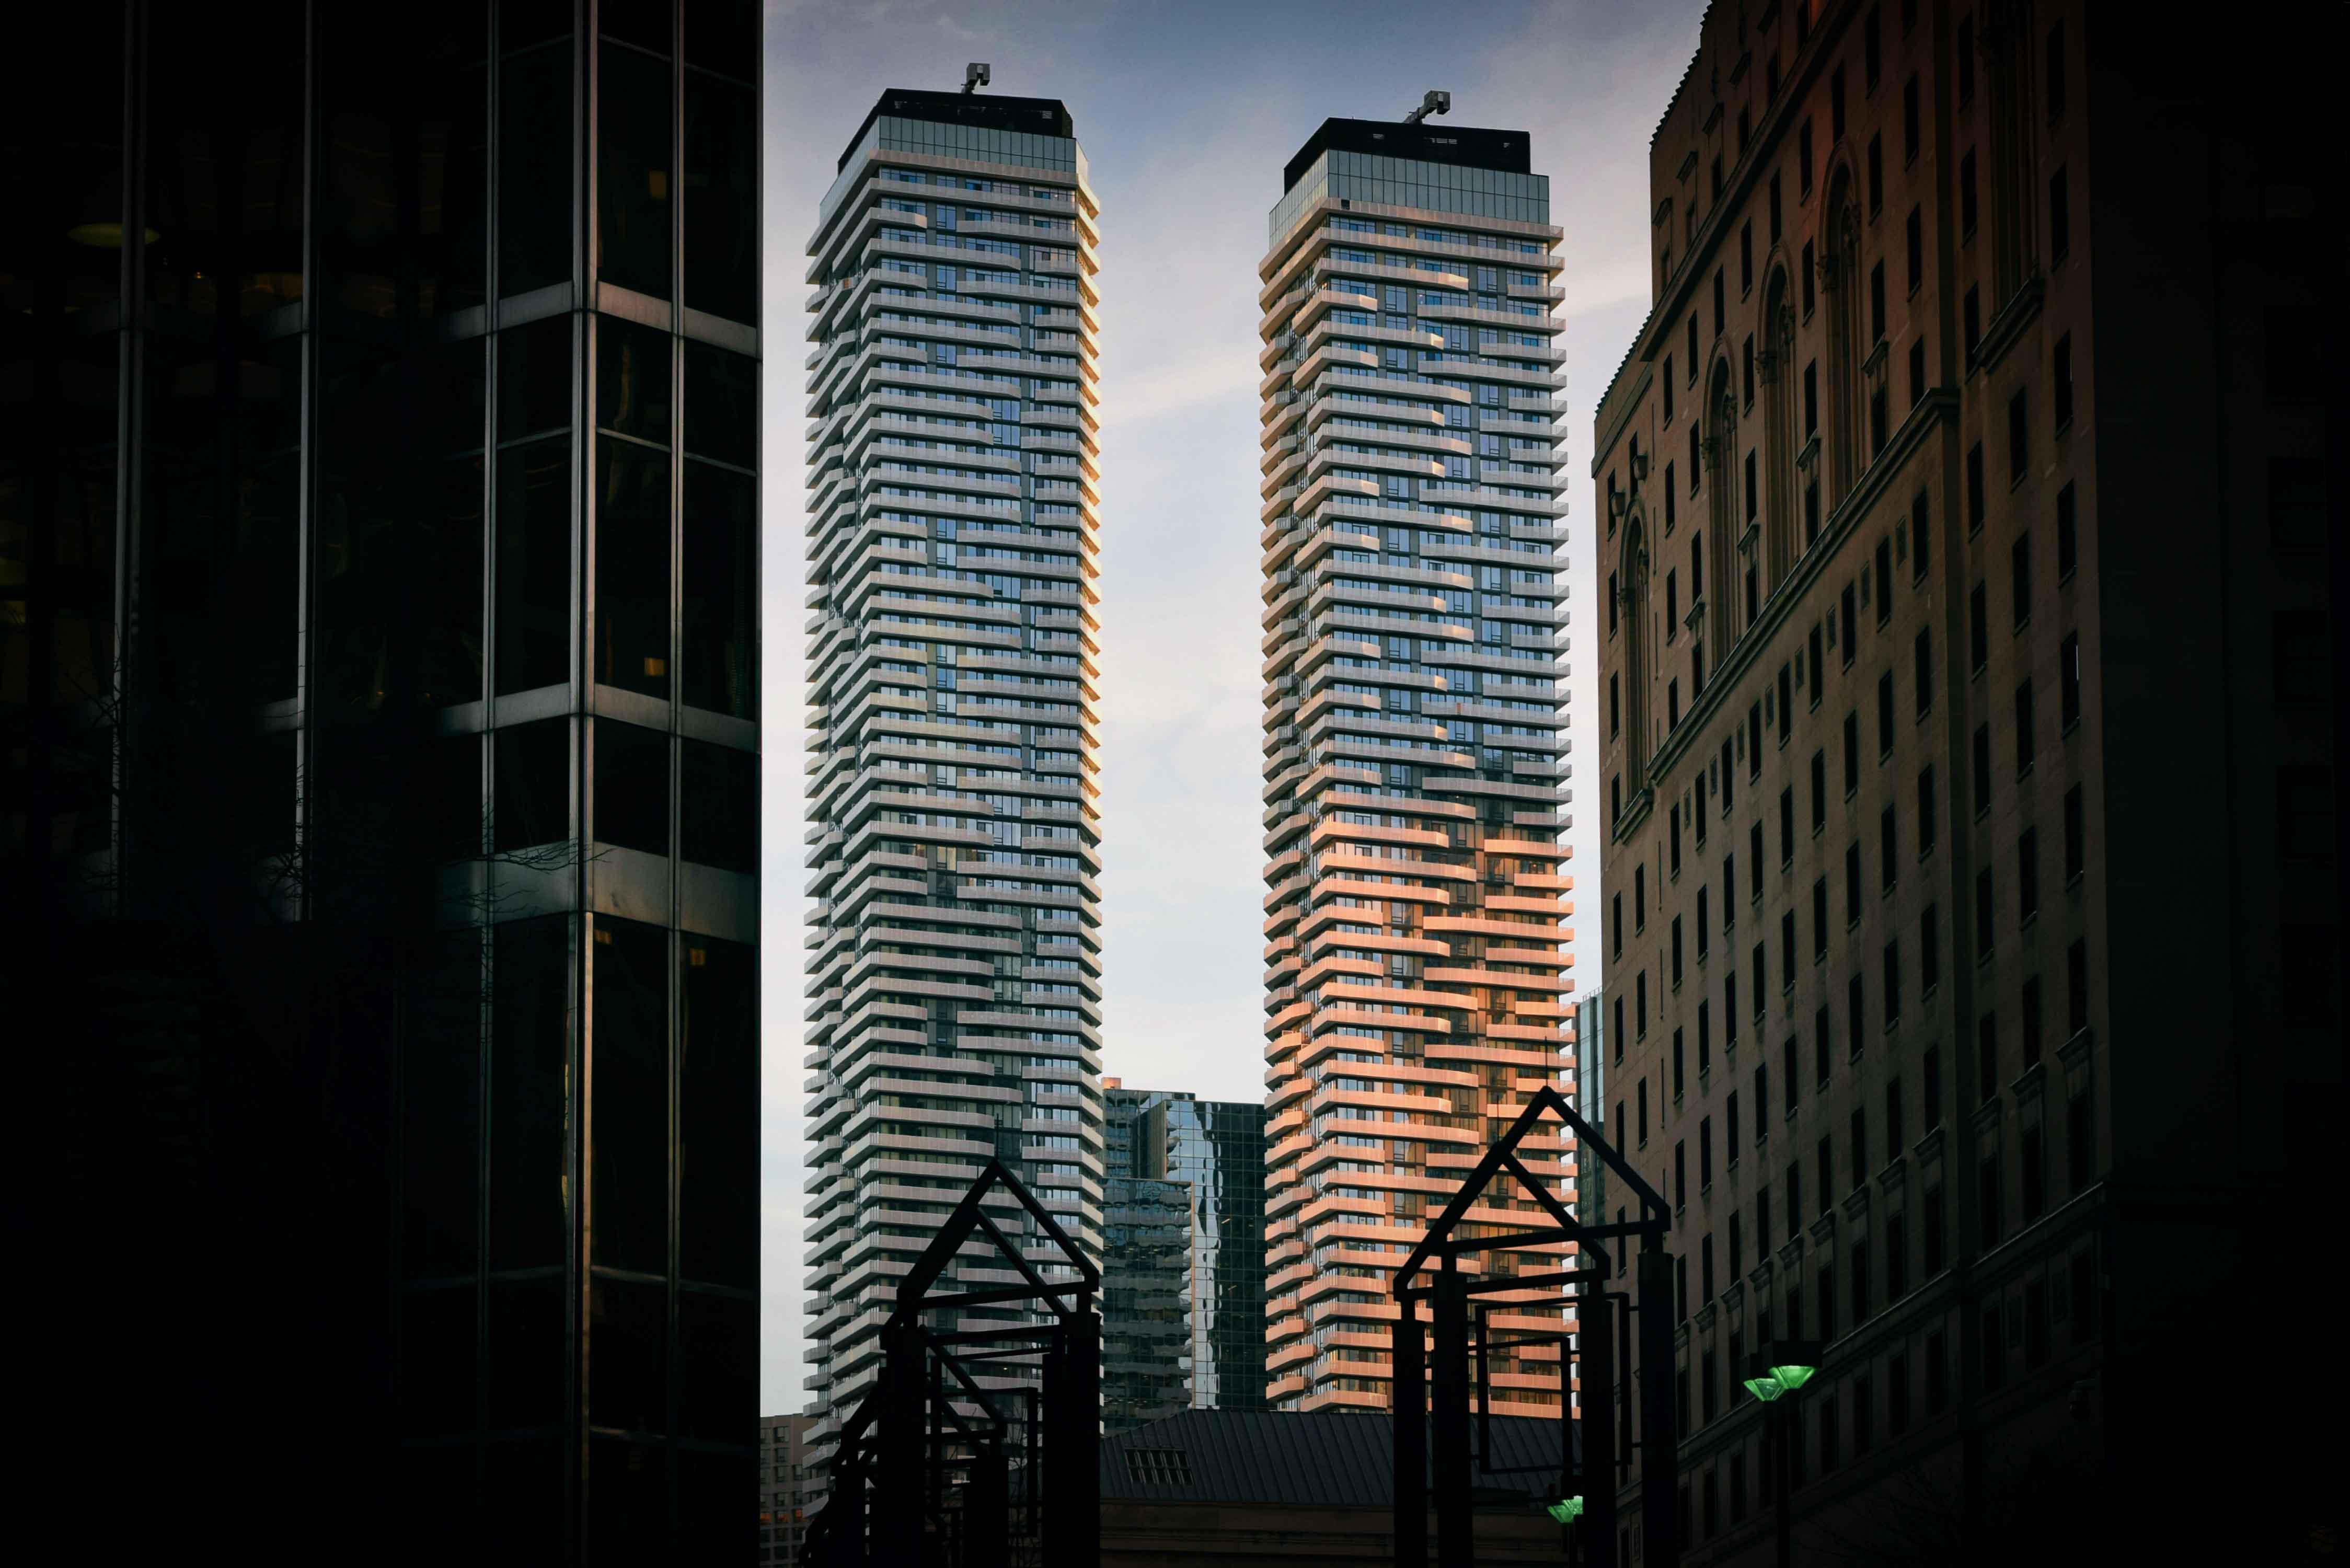 New Condo Buildings in Toronto: Market Wharf